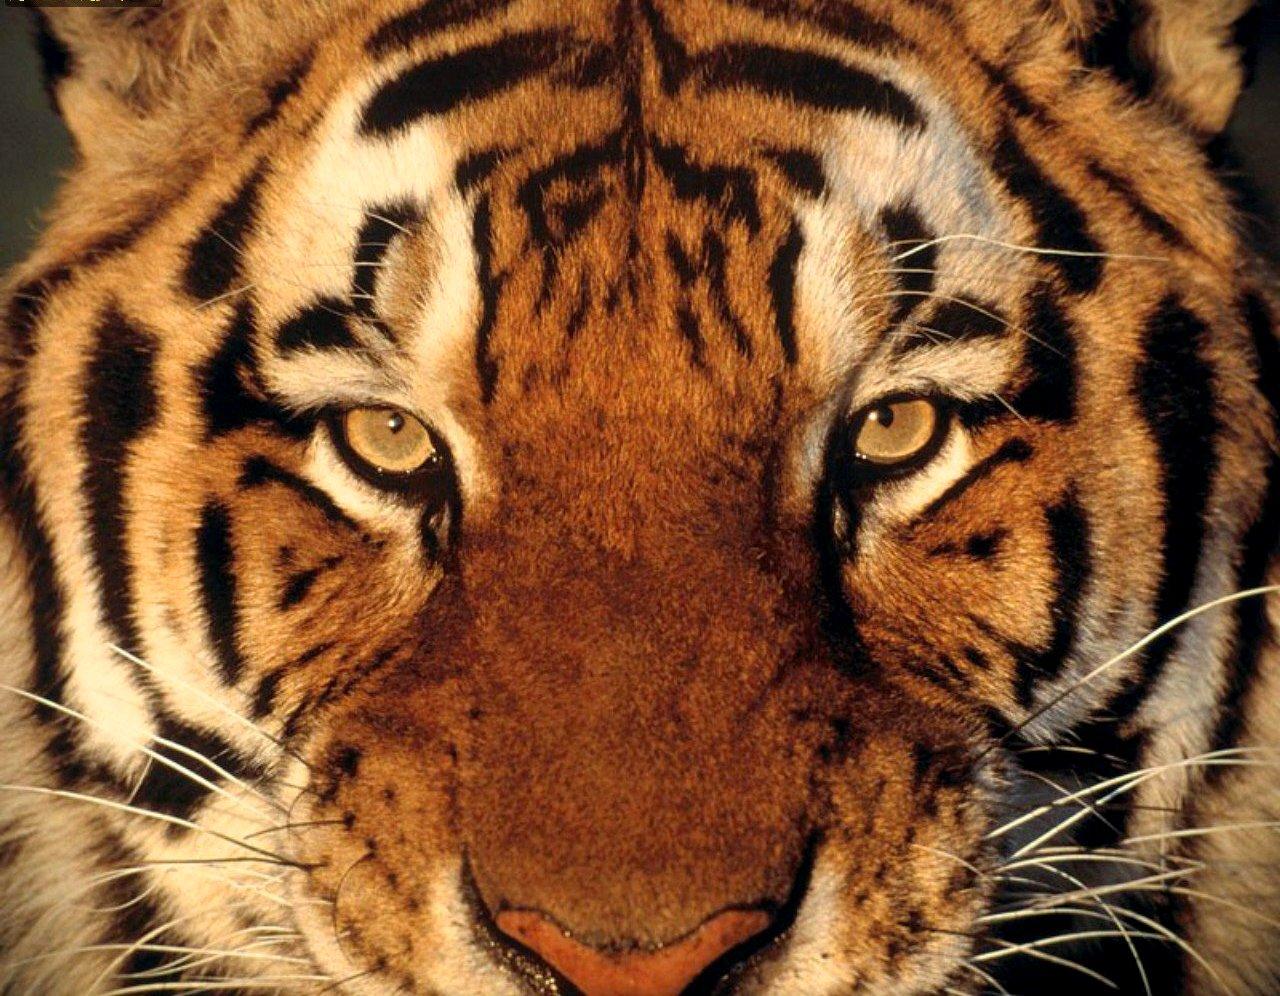 Tiger Tiger burning bright - william blake